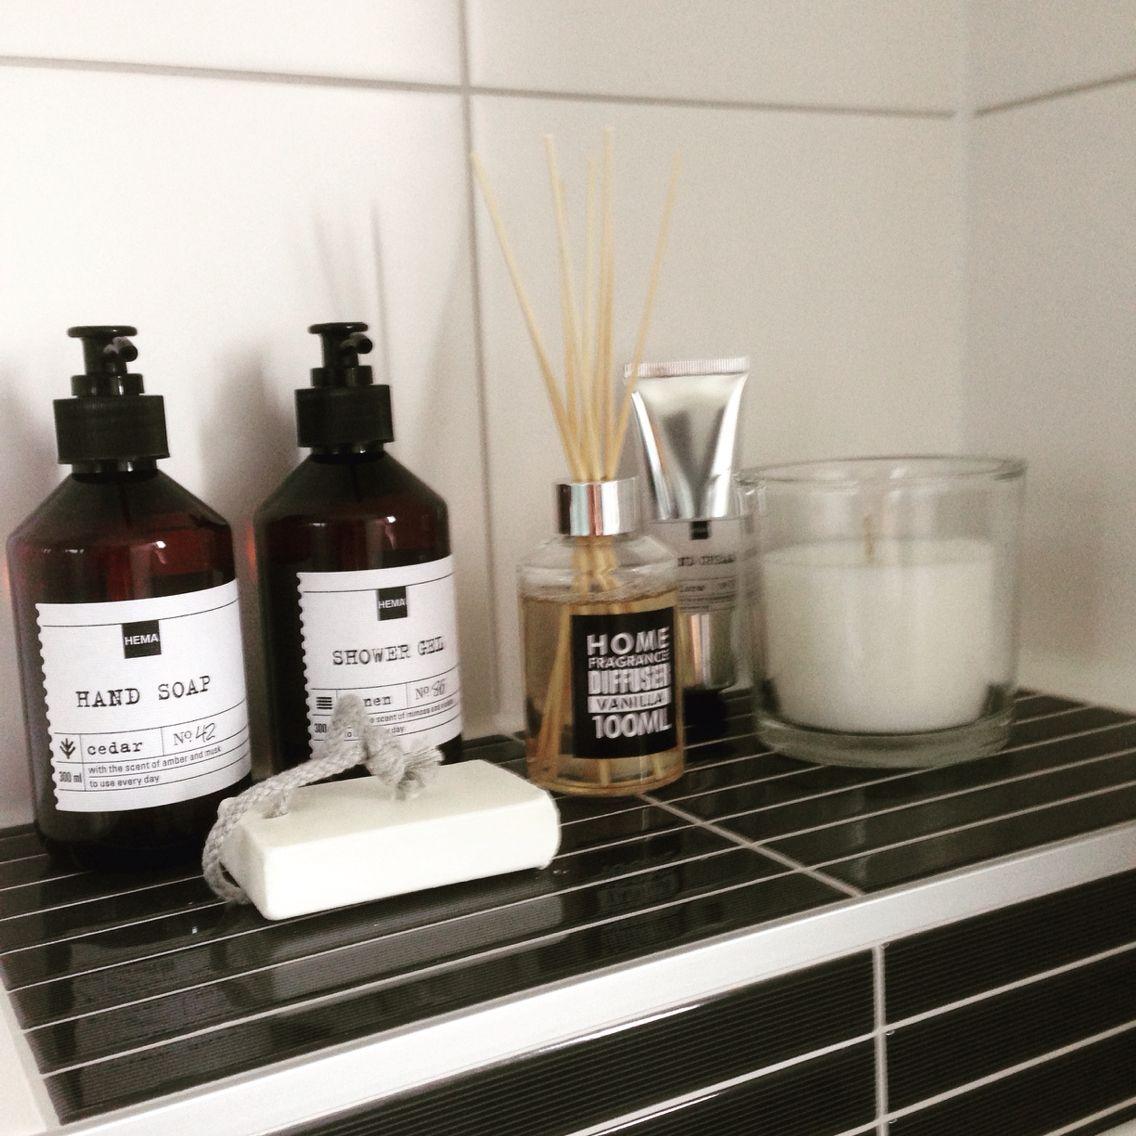 Hema accessoires in de badkamer | Hema | Pinterest | Toilet ...